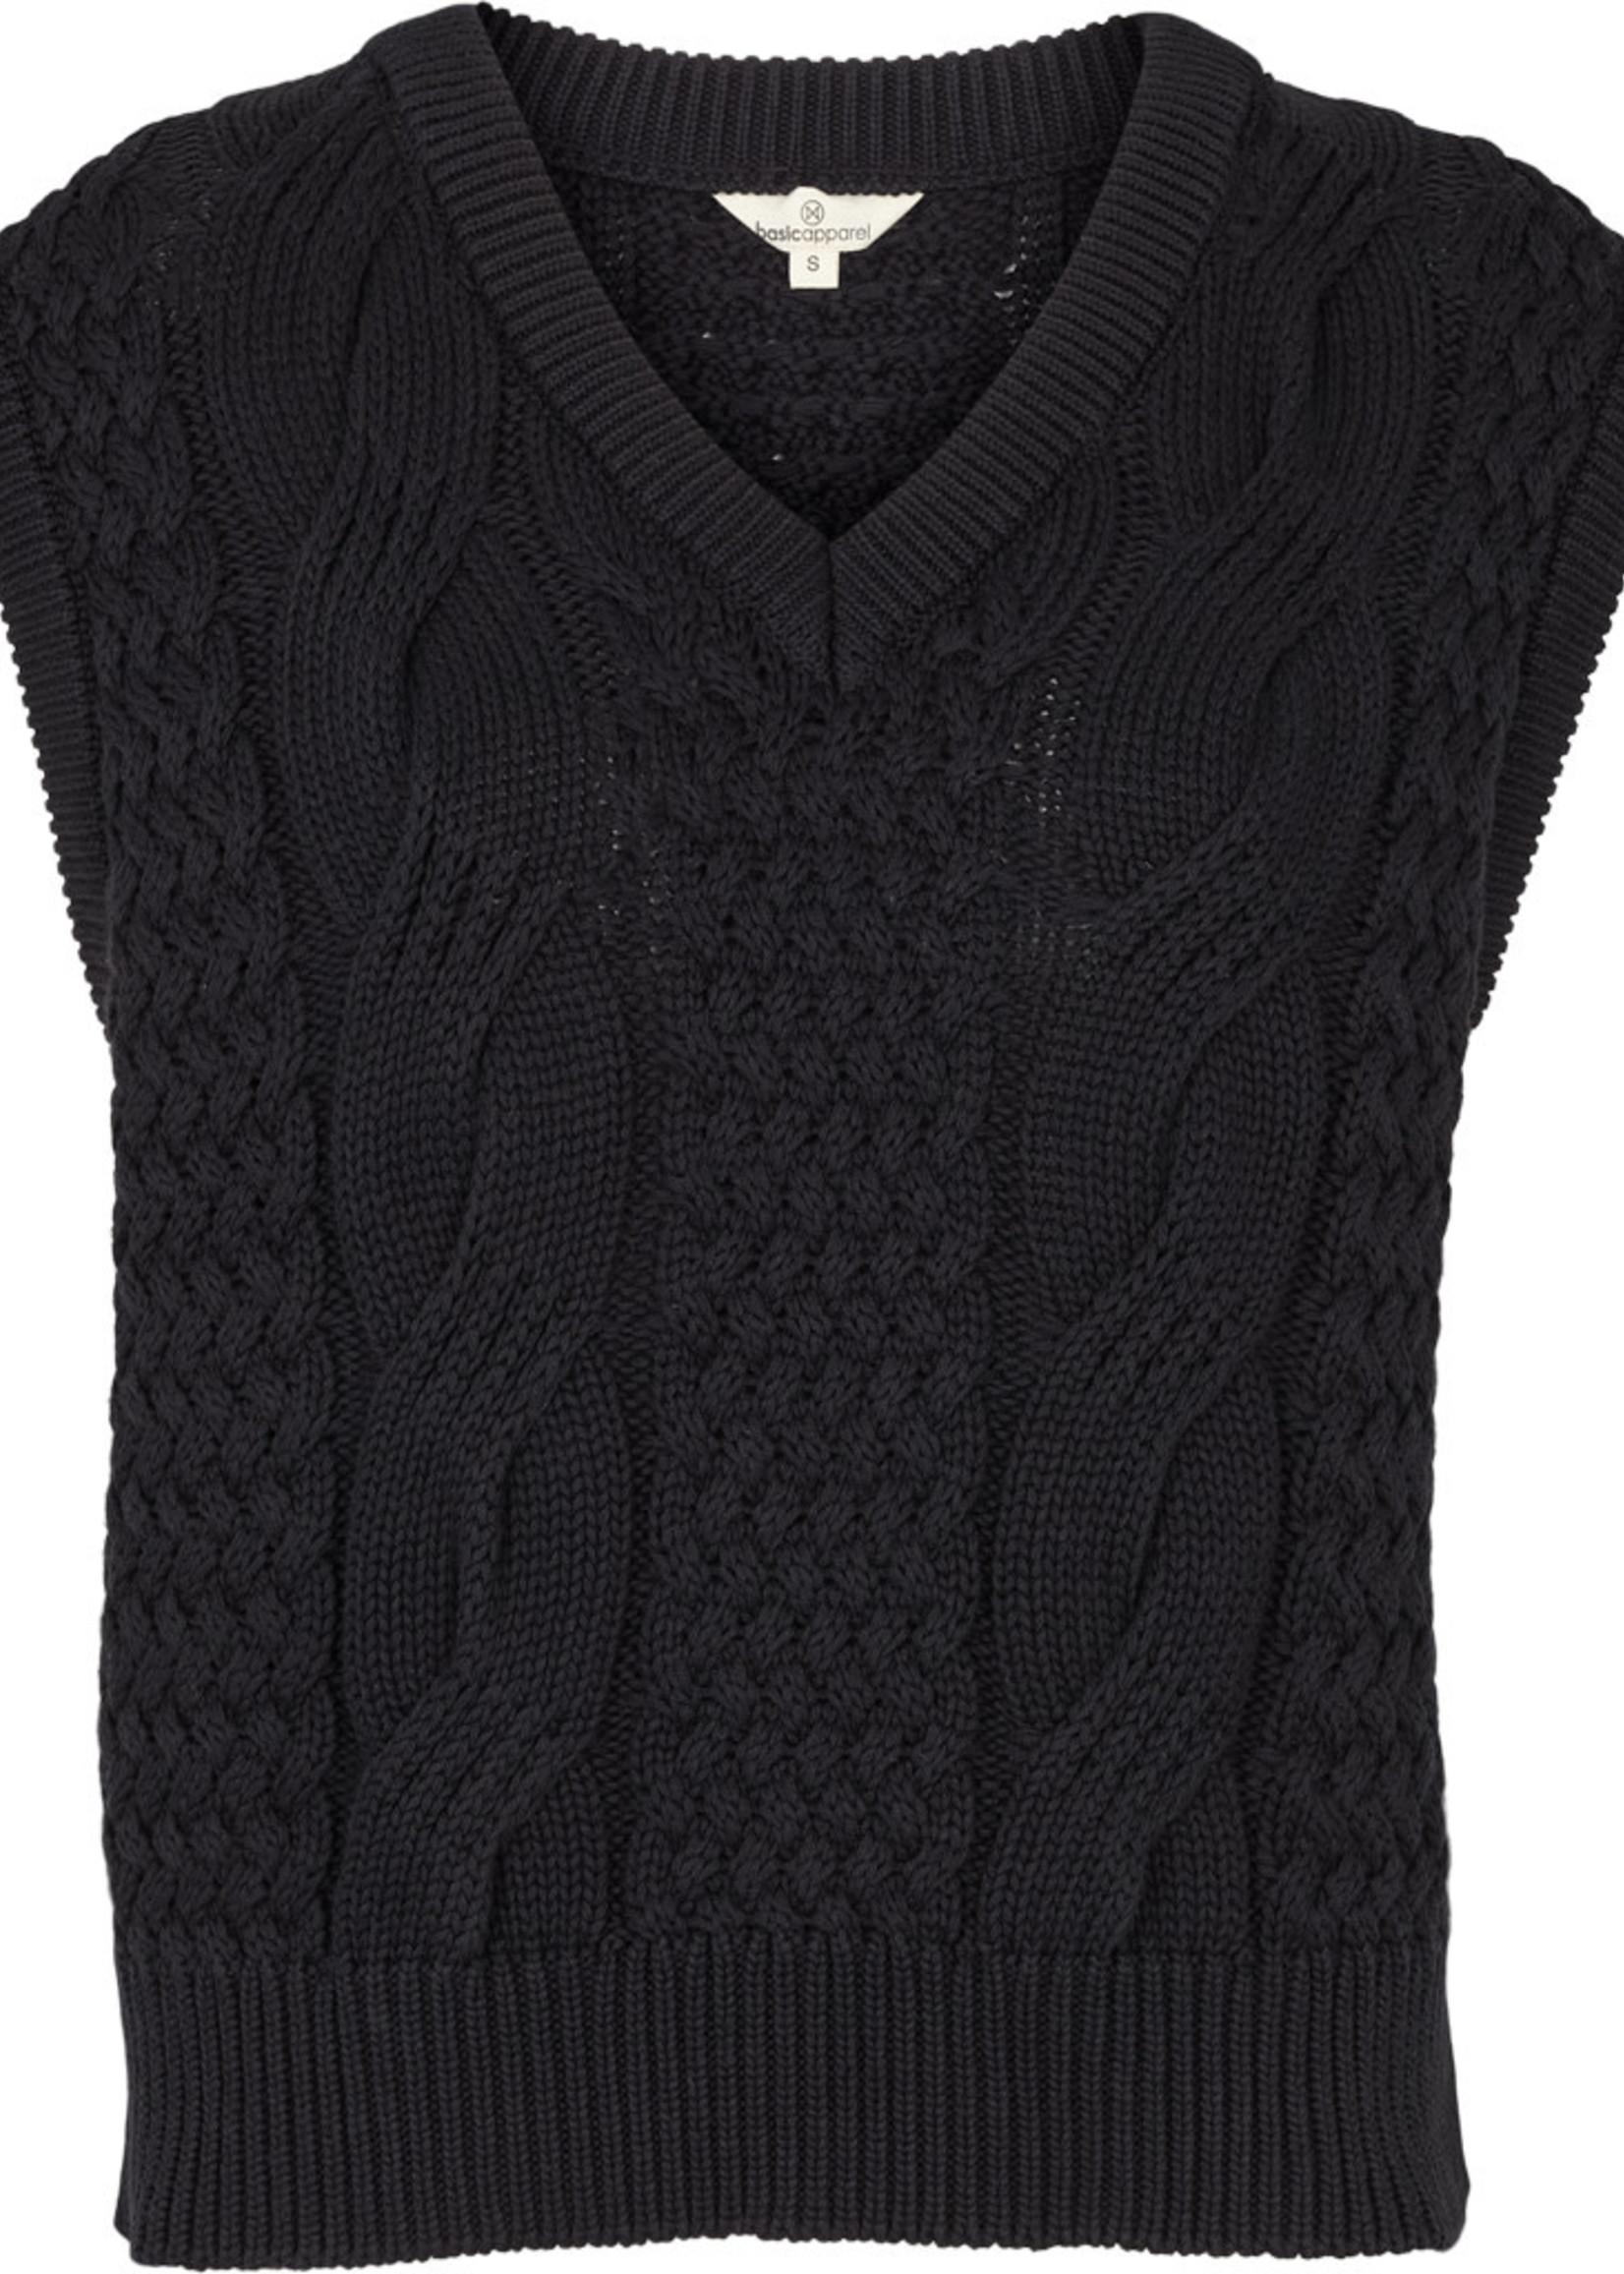 Basic Apparel Gina Vest